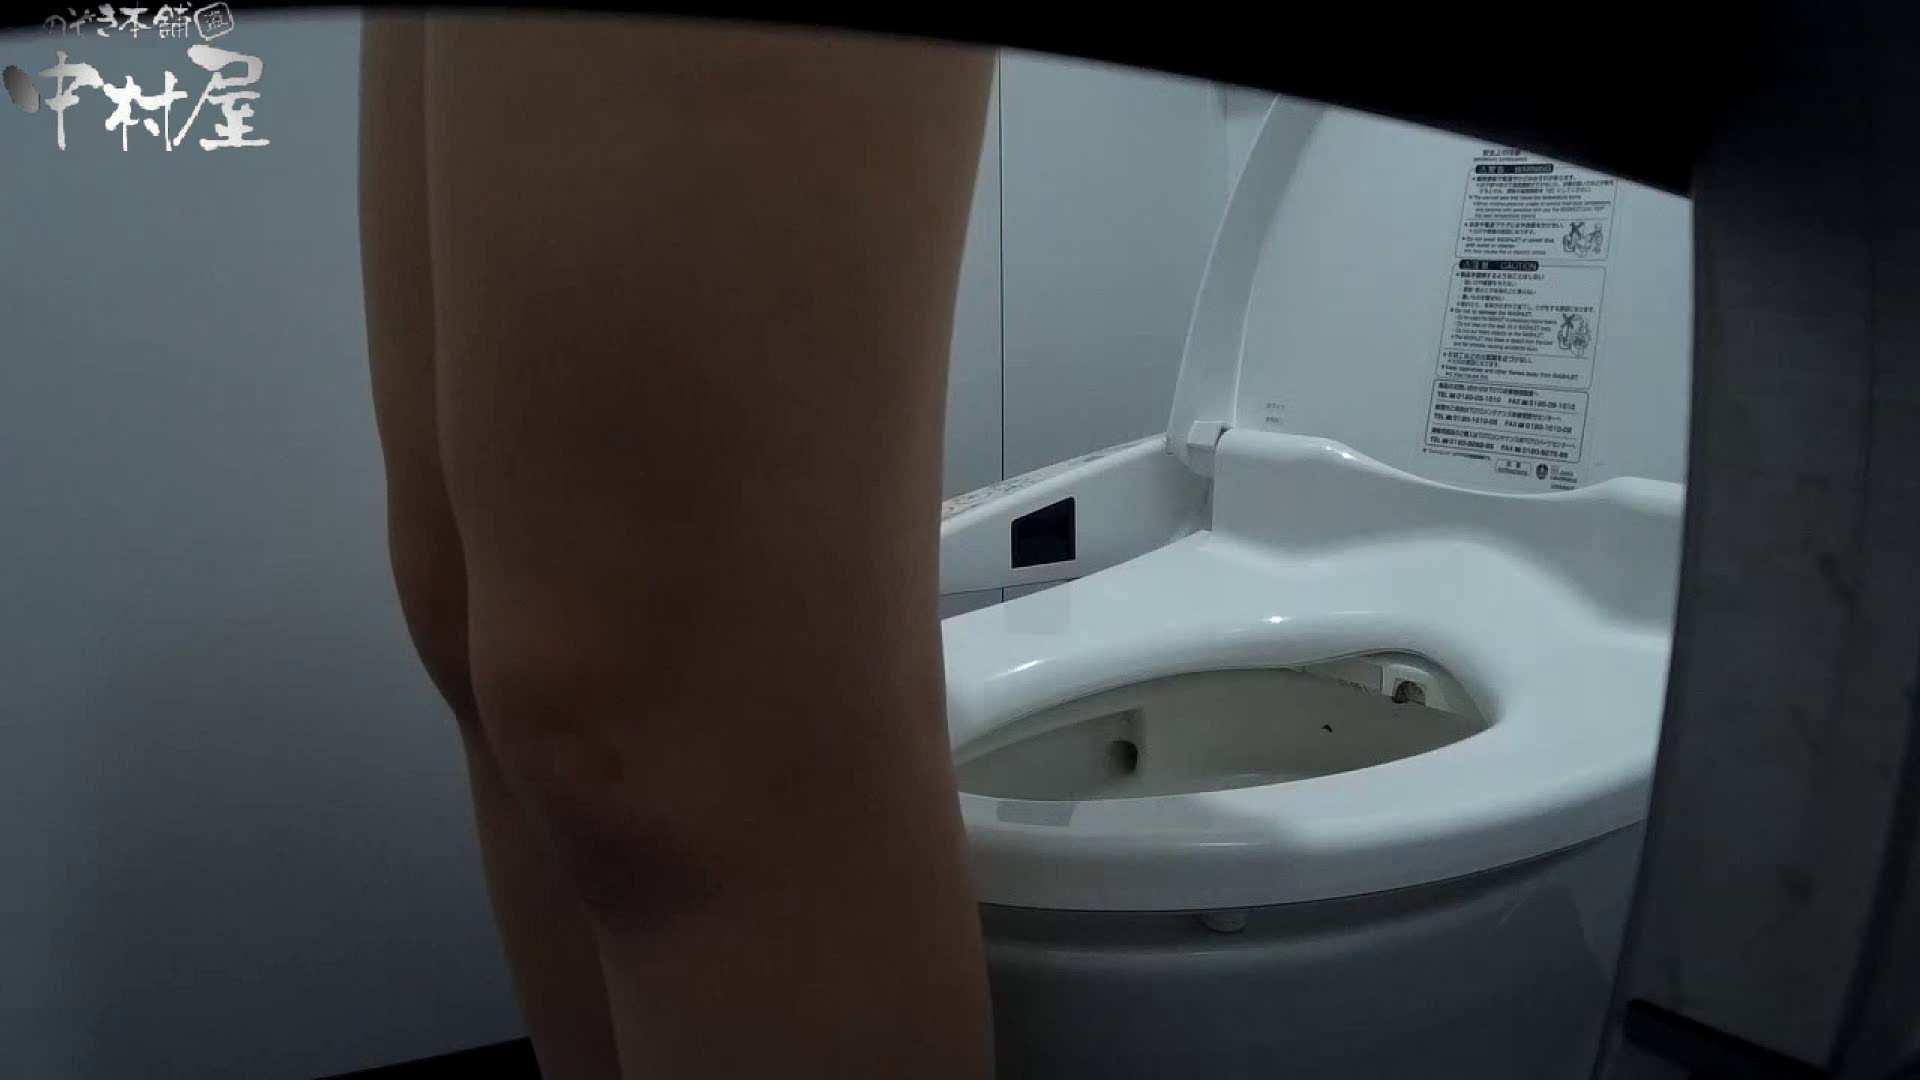 【某有名大学女性洗面所】有名大学女性洗面所 vol.35 安定の2カメ 最近の女性は保守的な下着が多め? 下着   潜入画像  83画像 15